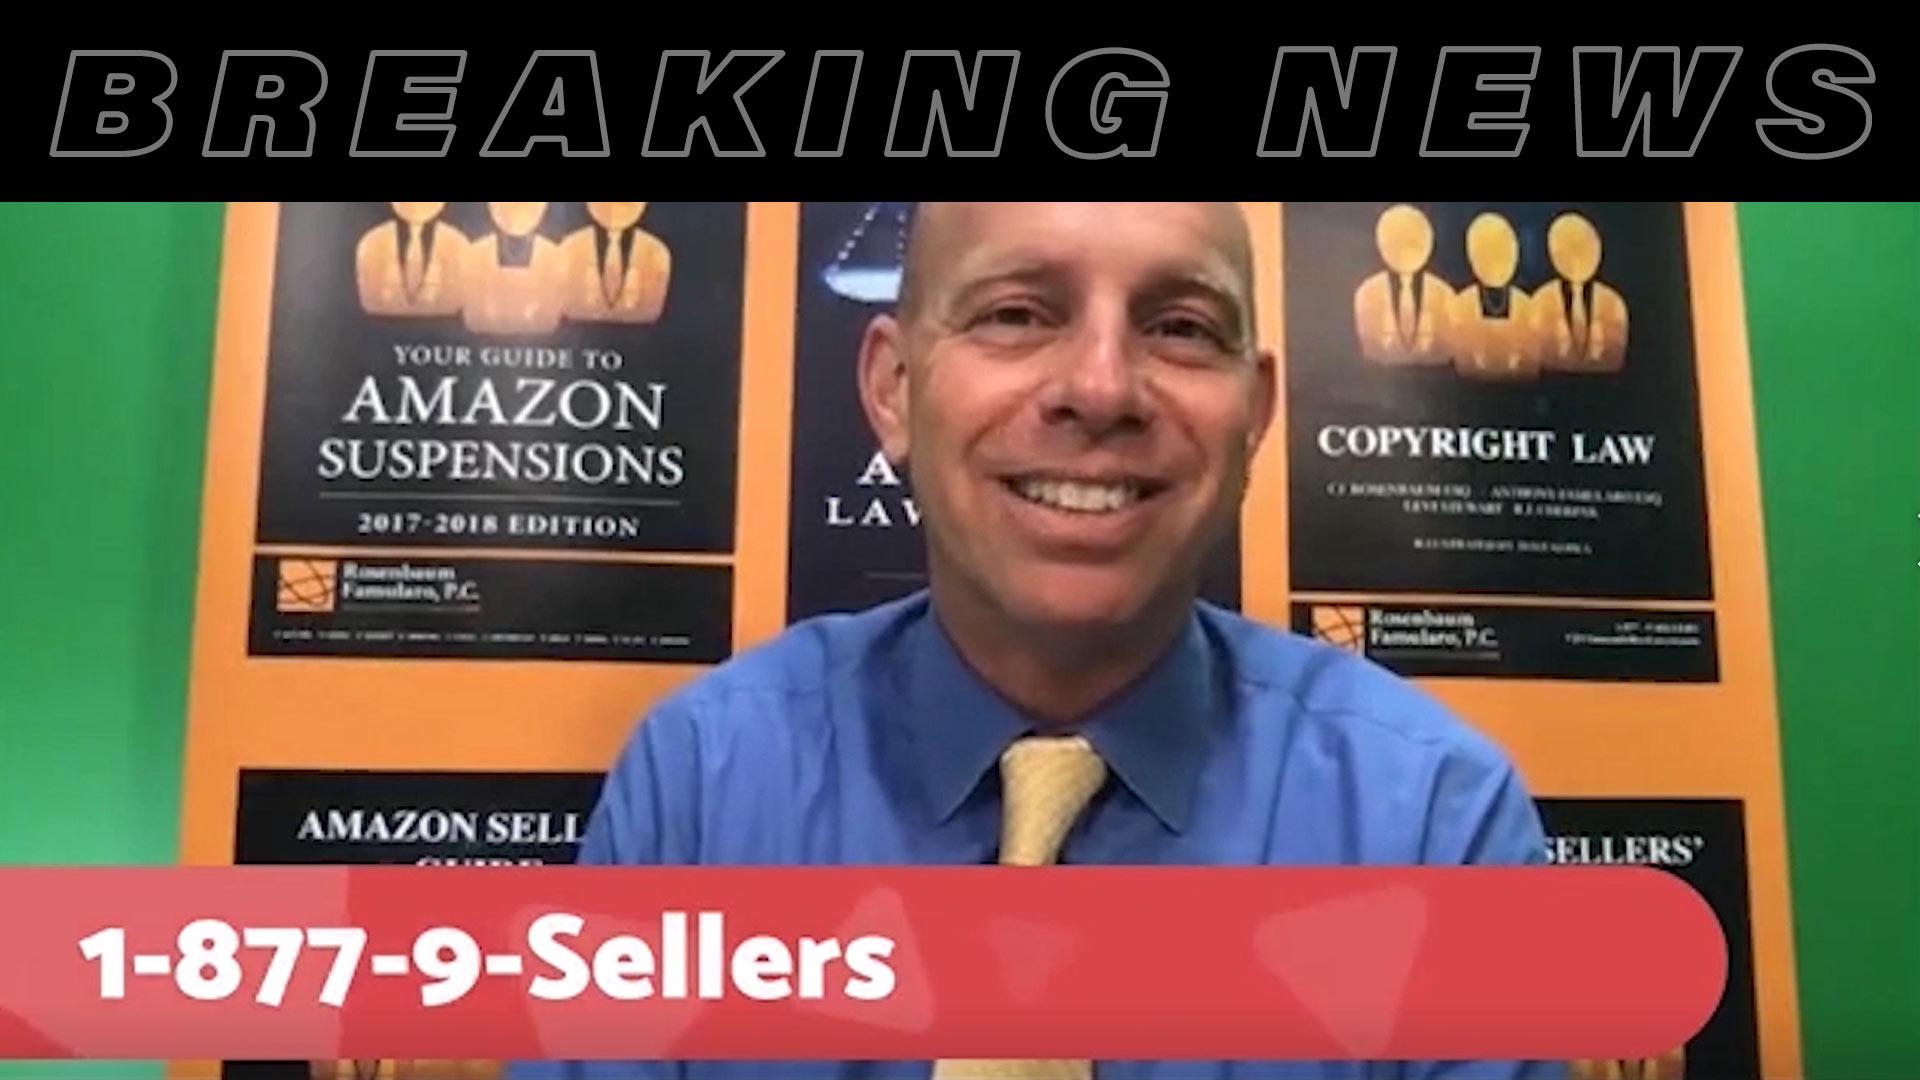 Amazon Suspension News Update